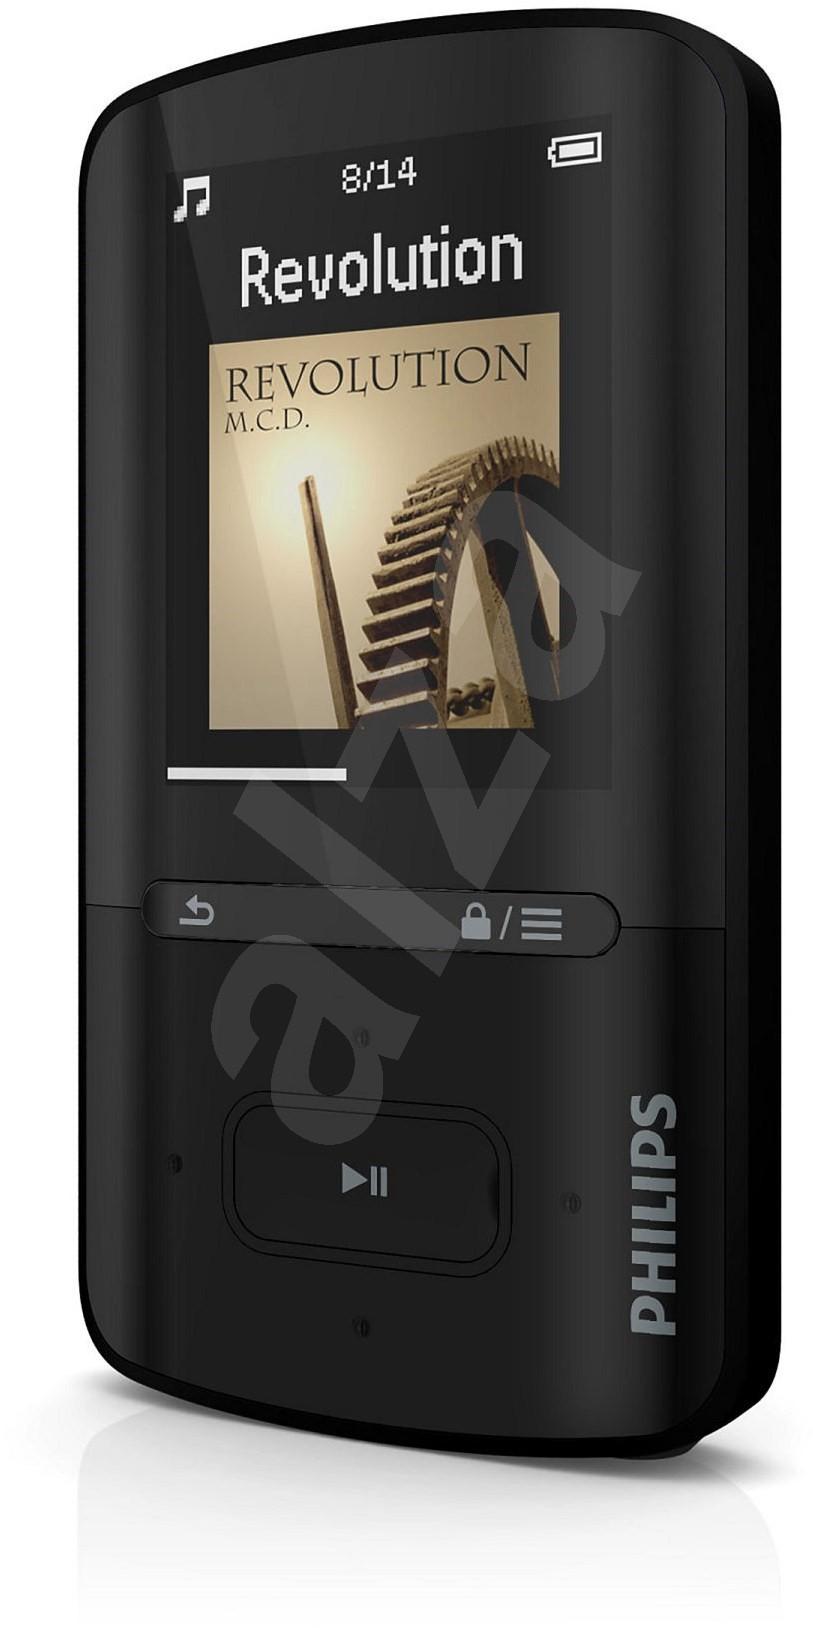 philips vibe sa4vbe04kf black mp4 player. Black Bedroom Furniture Sets. Home Design Ideas